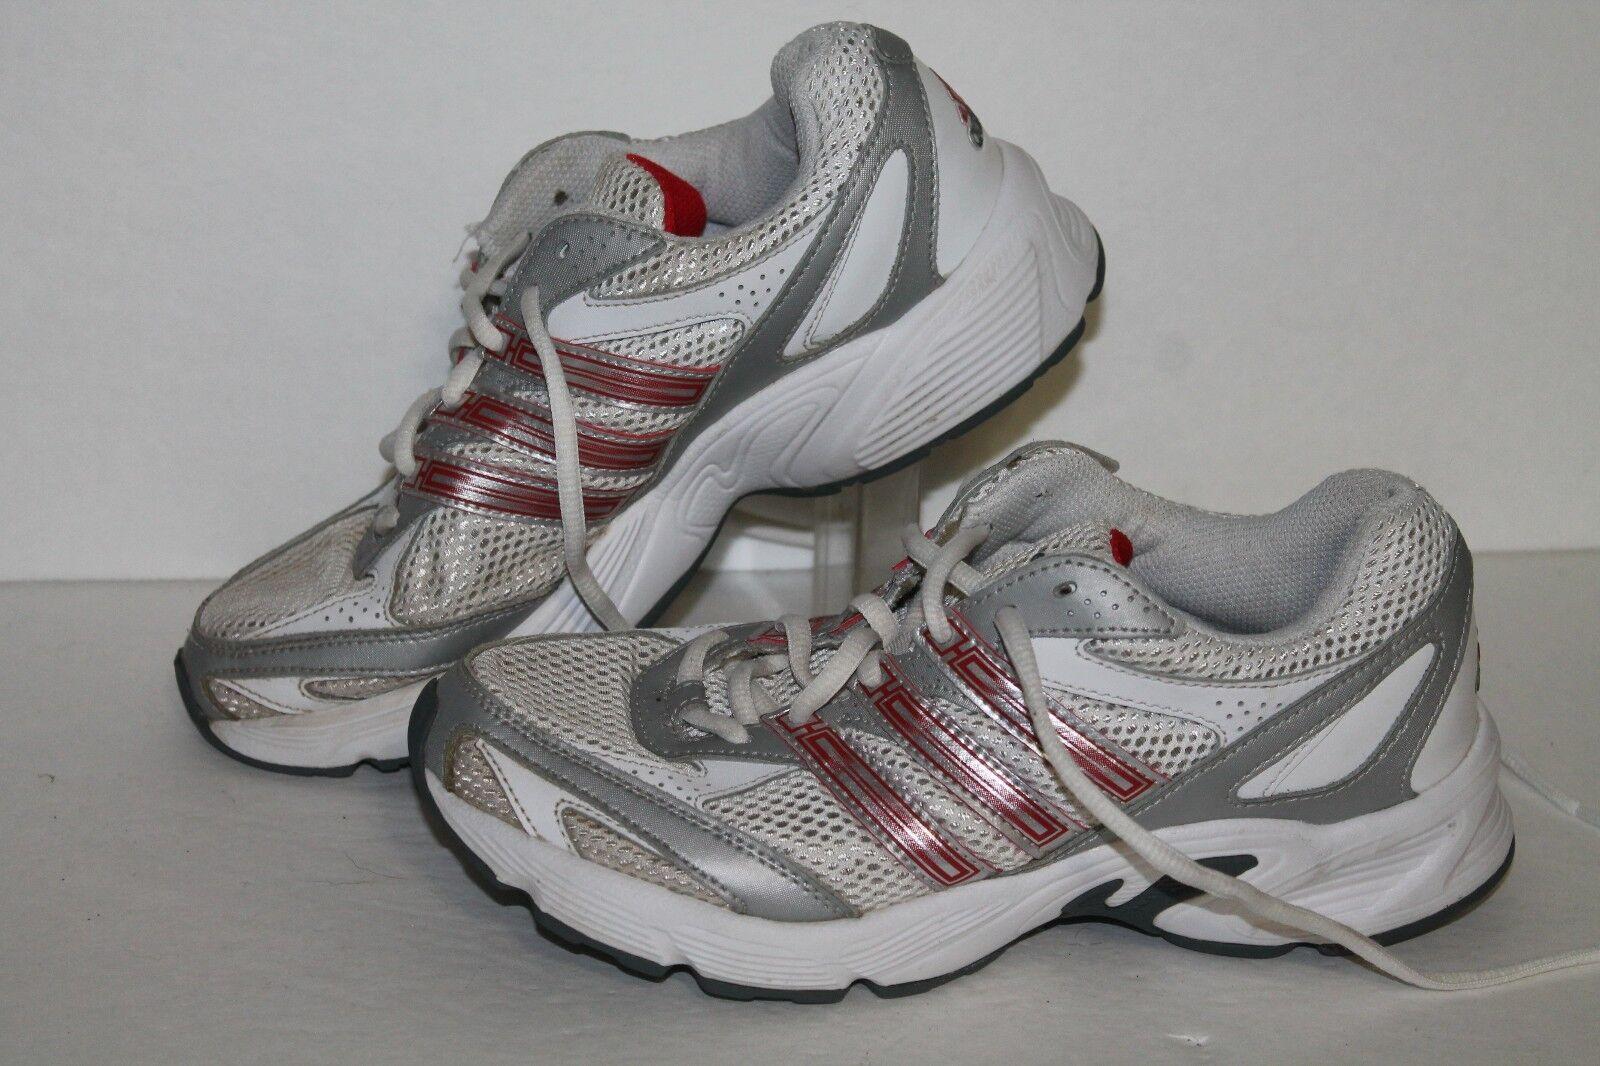 Adidas sconfiggere 3 scarpe da corsa,   g09407, bianco   rosso   argentoo, le donne noi 6,5 | Buy Speciale  | Maschio/Ragazze Scarpa